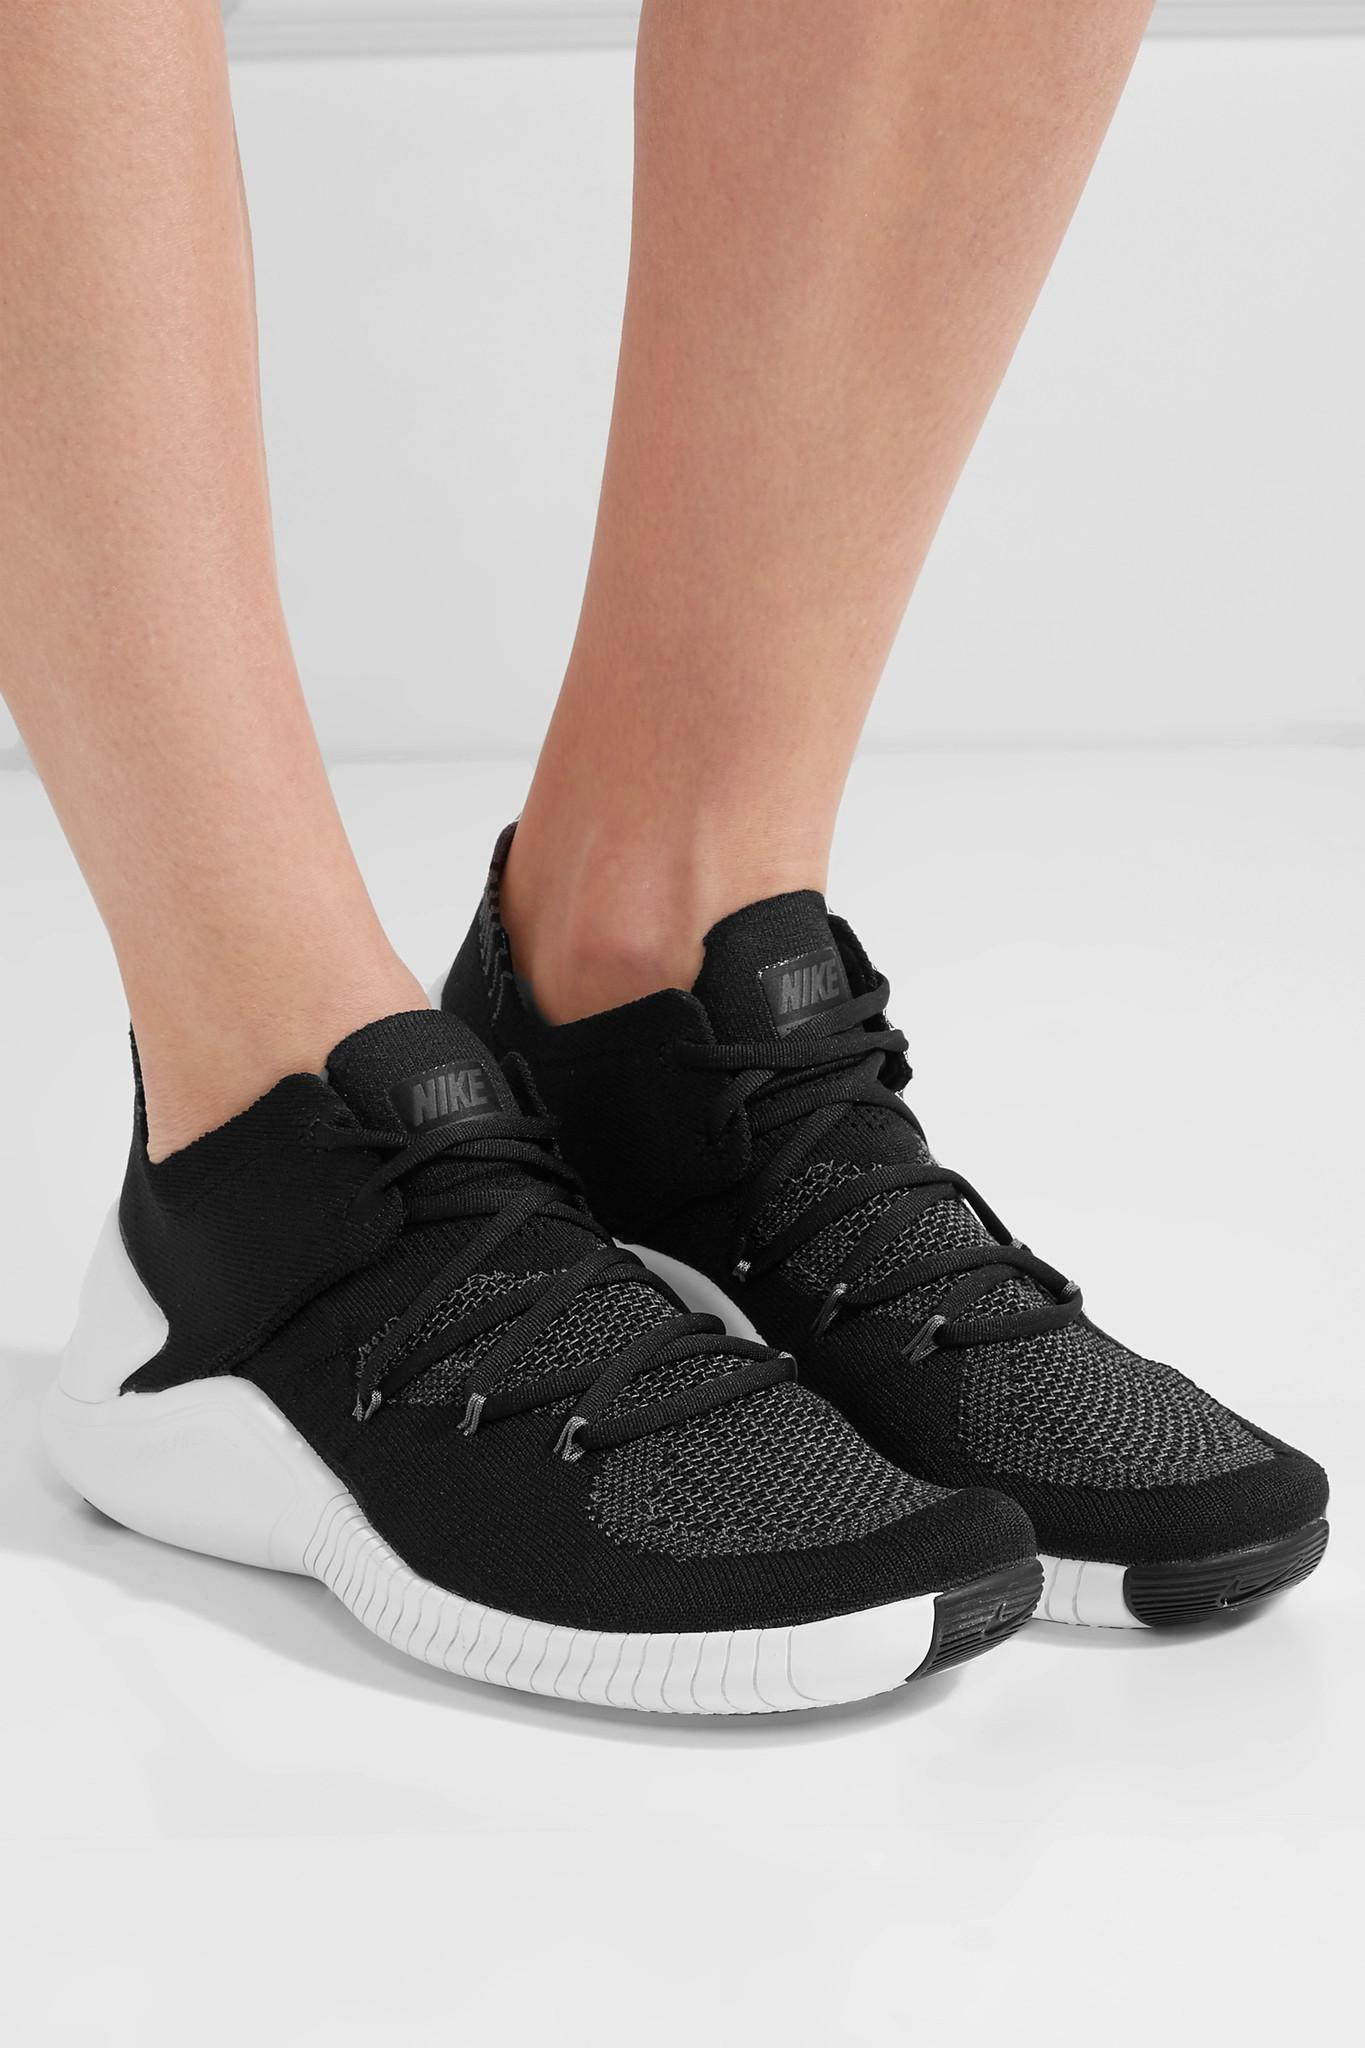 b6e0369857d Nike - Black Free Tr 3 Flyknit Sneakers - Lyst. View fullscreen